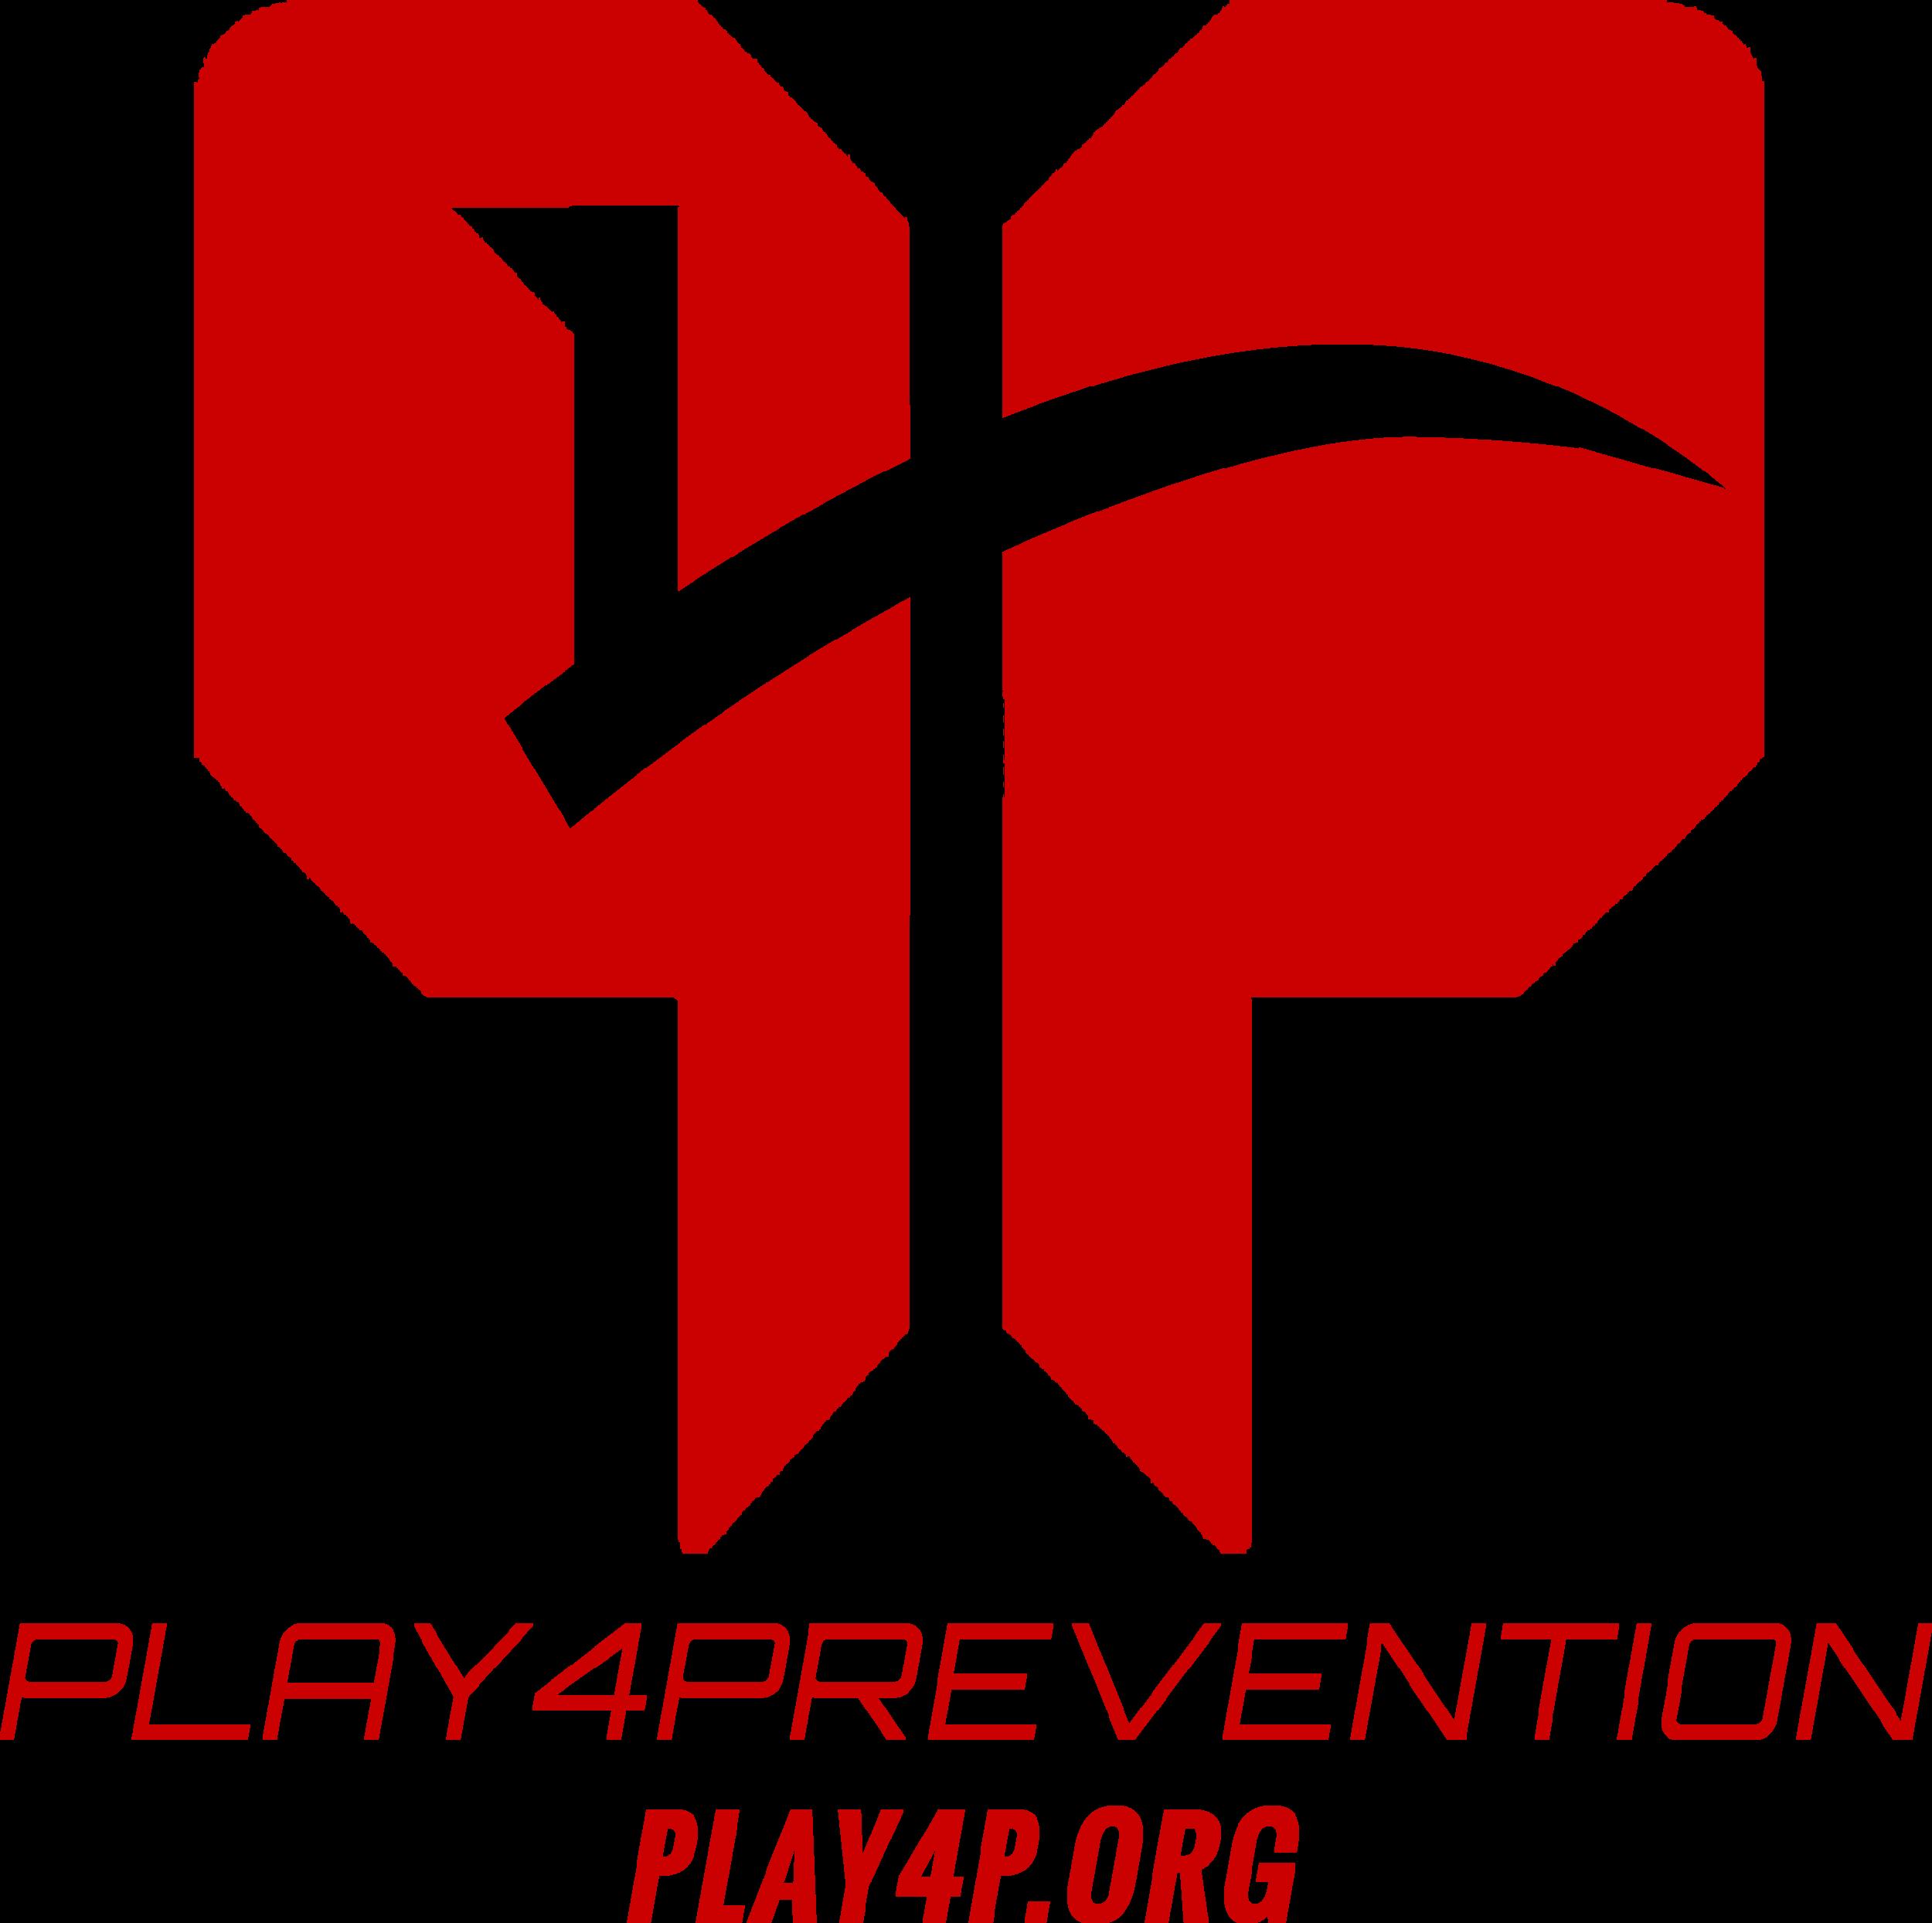 P4P new logo1.png